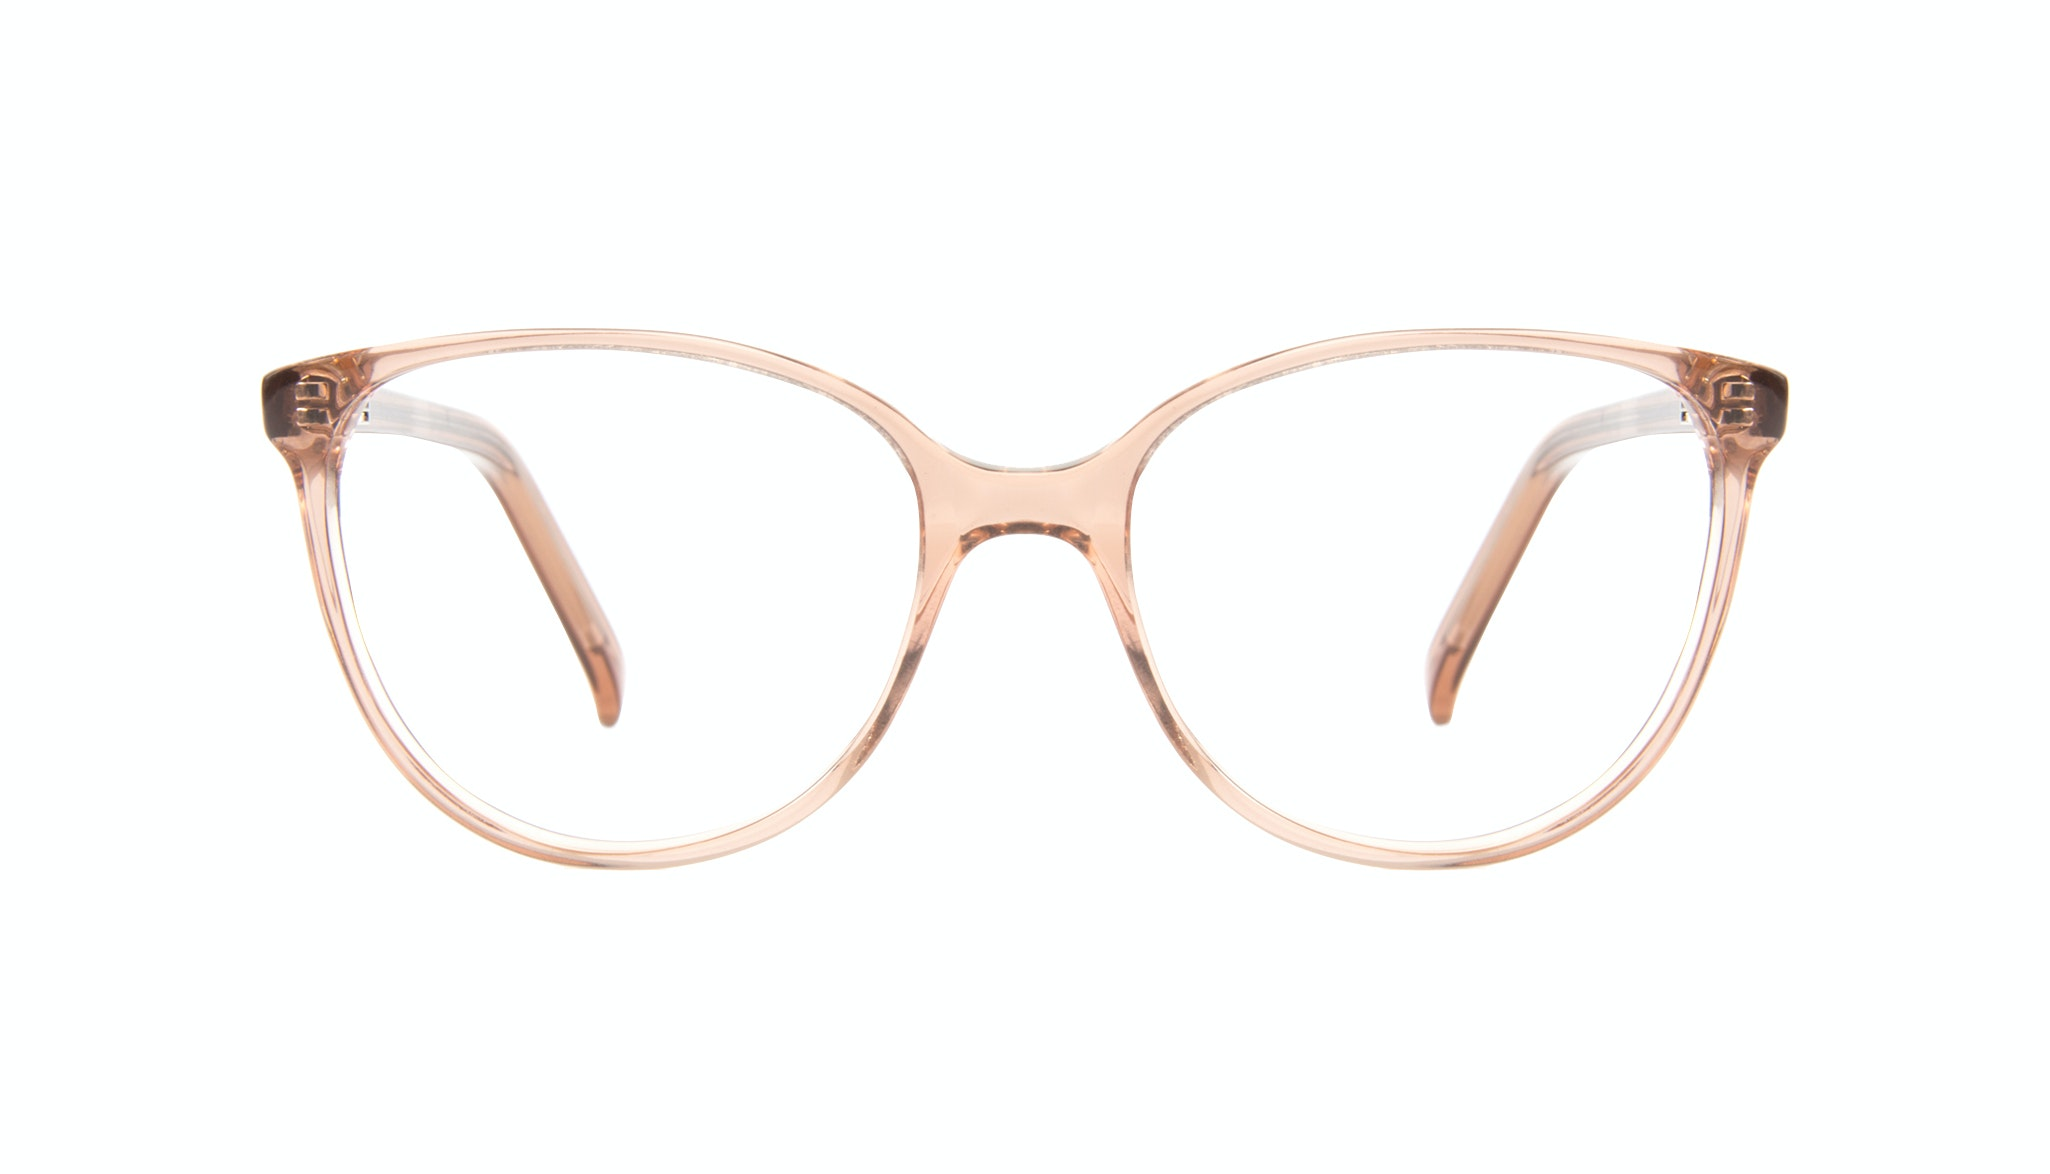 Affordable Fashion Glasses Round Eyeglasses Women Imagine Petite Rose Front